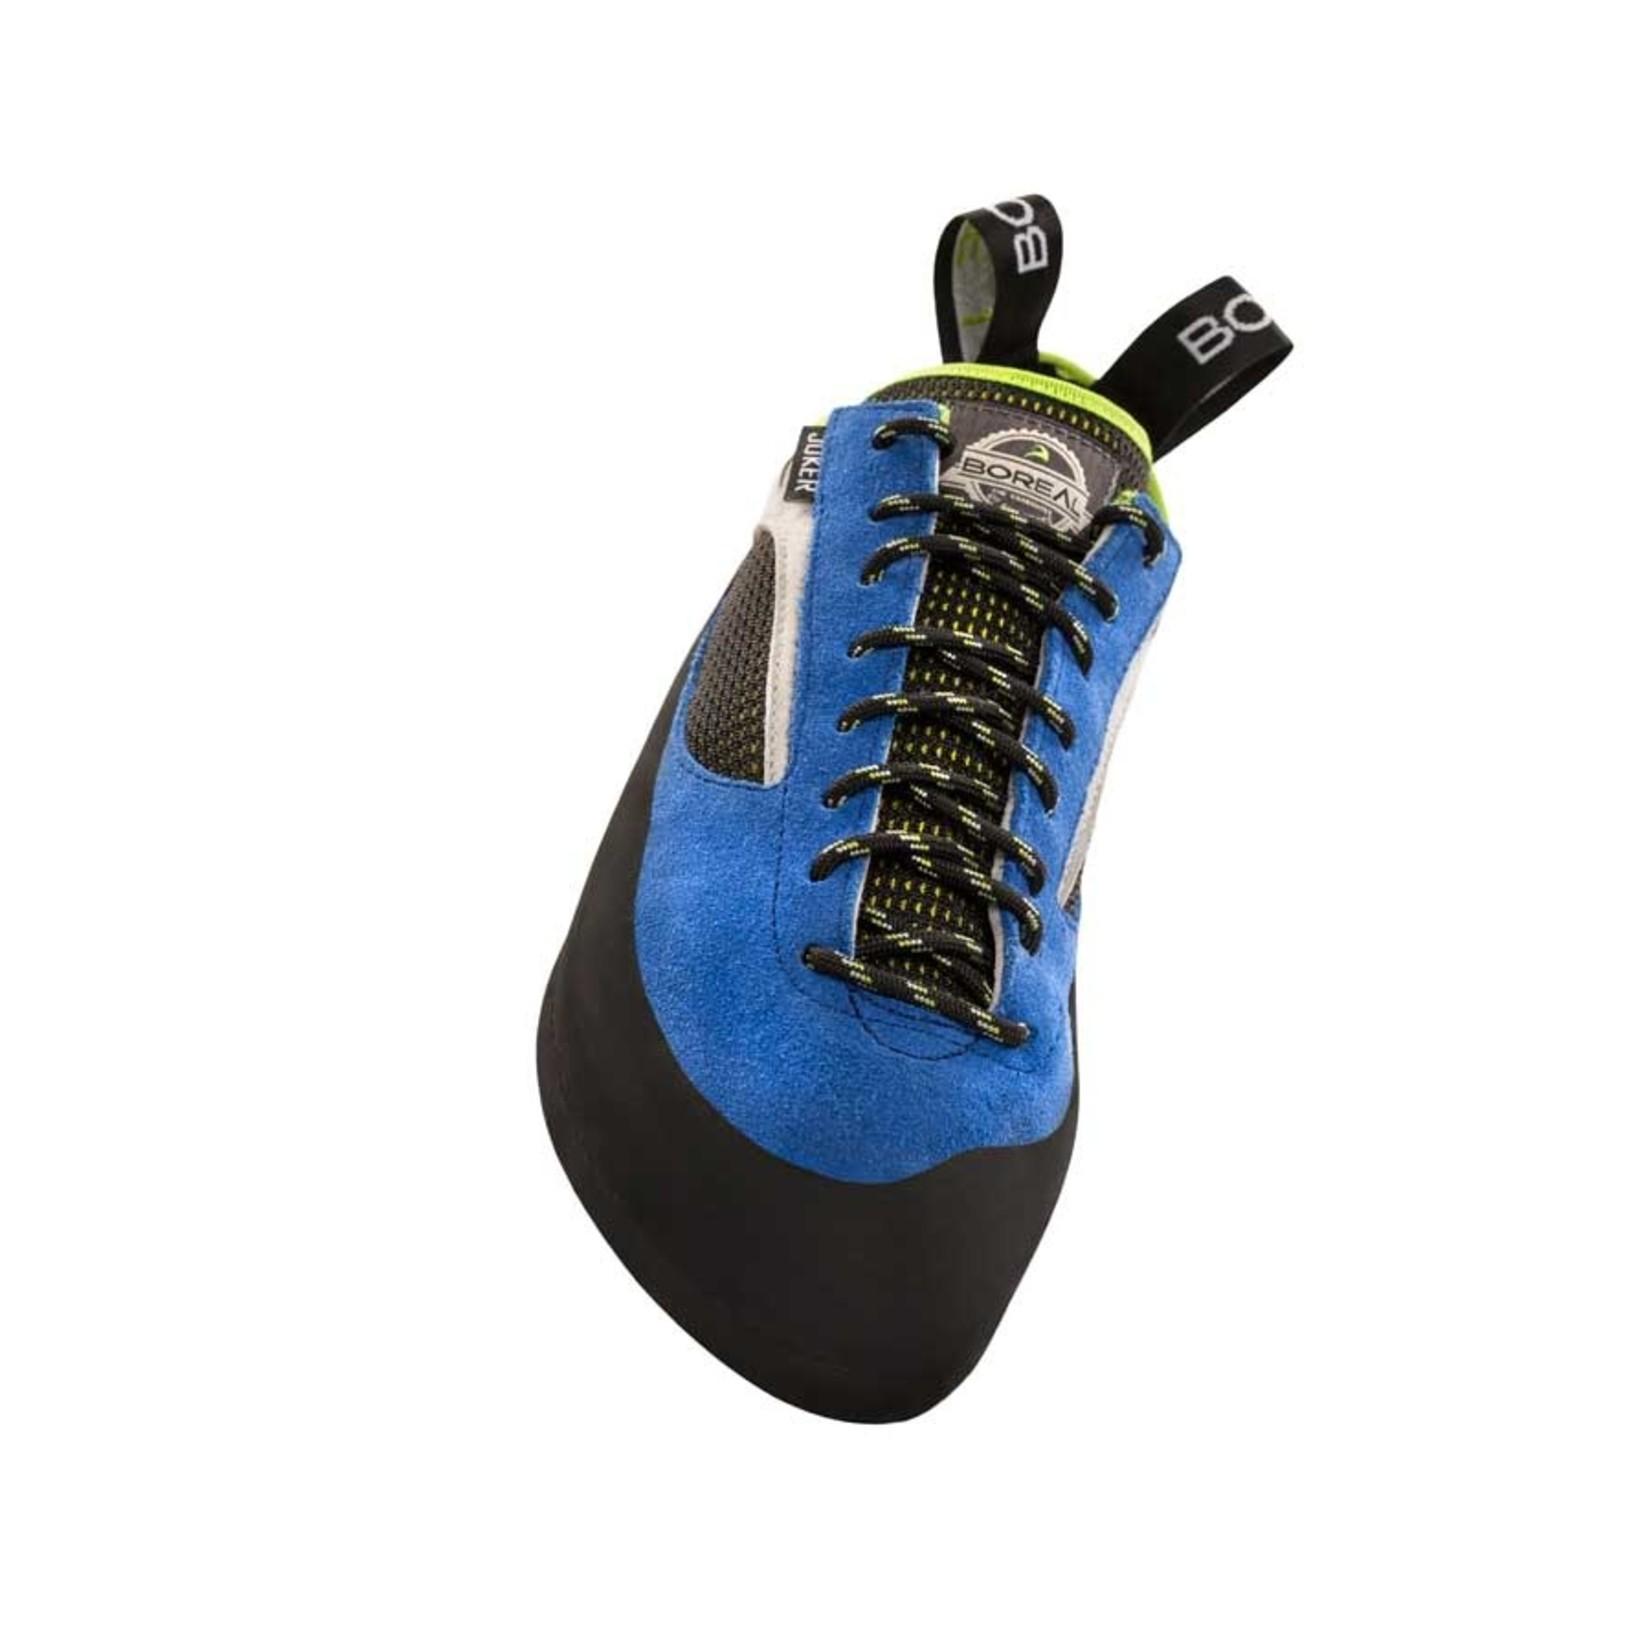 Boreal Boreal Joker Lace Climbing Shoe